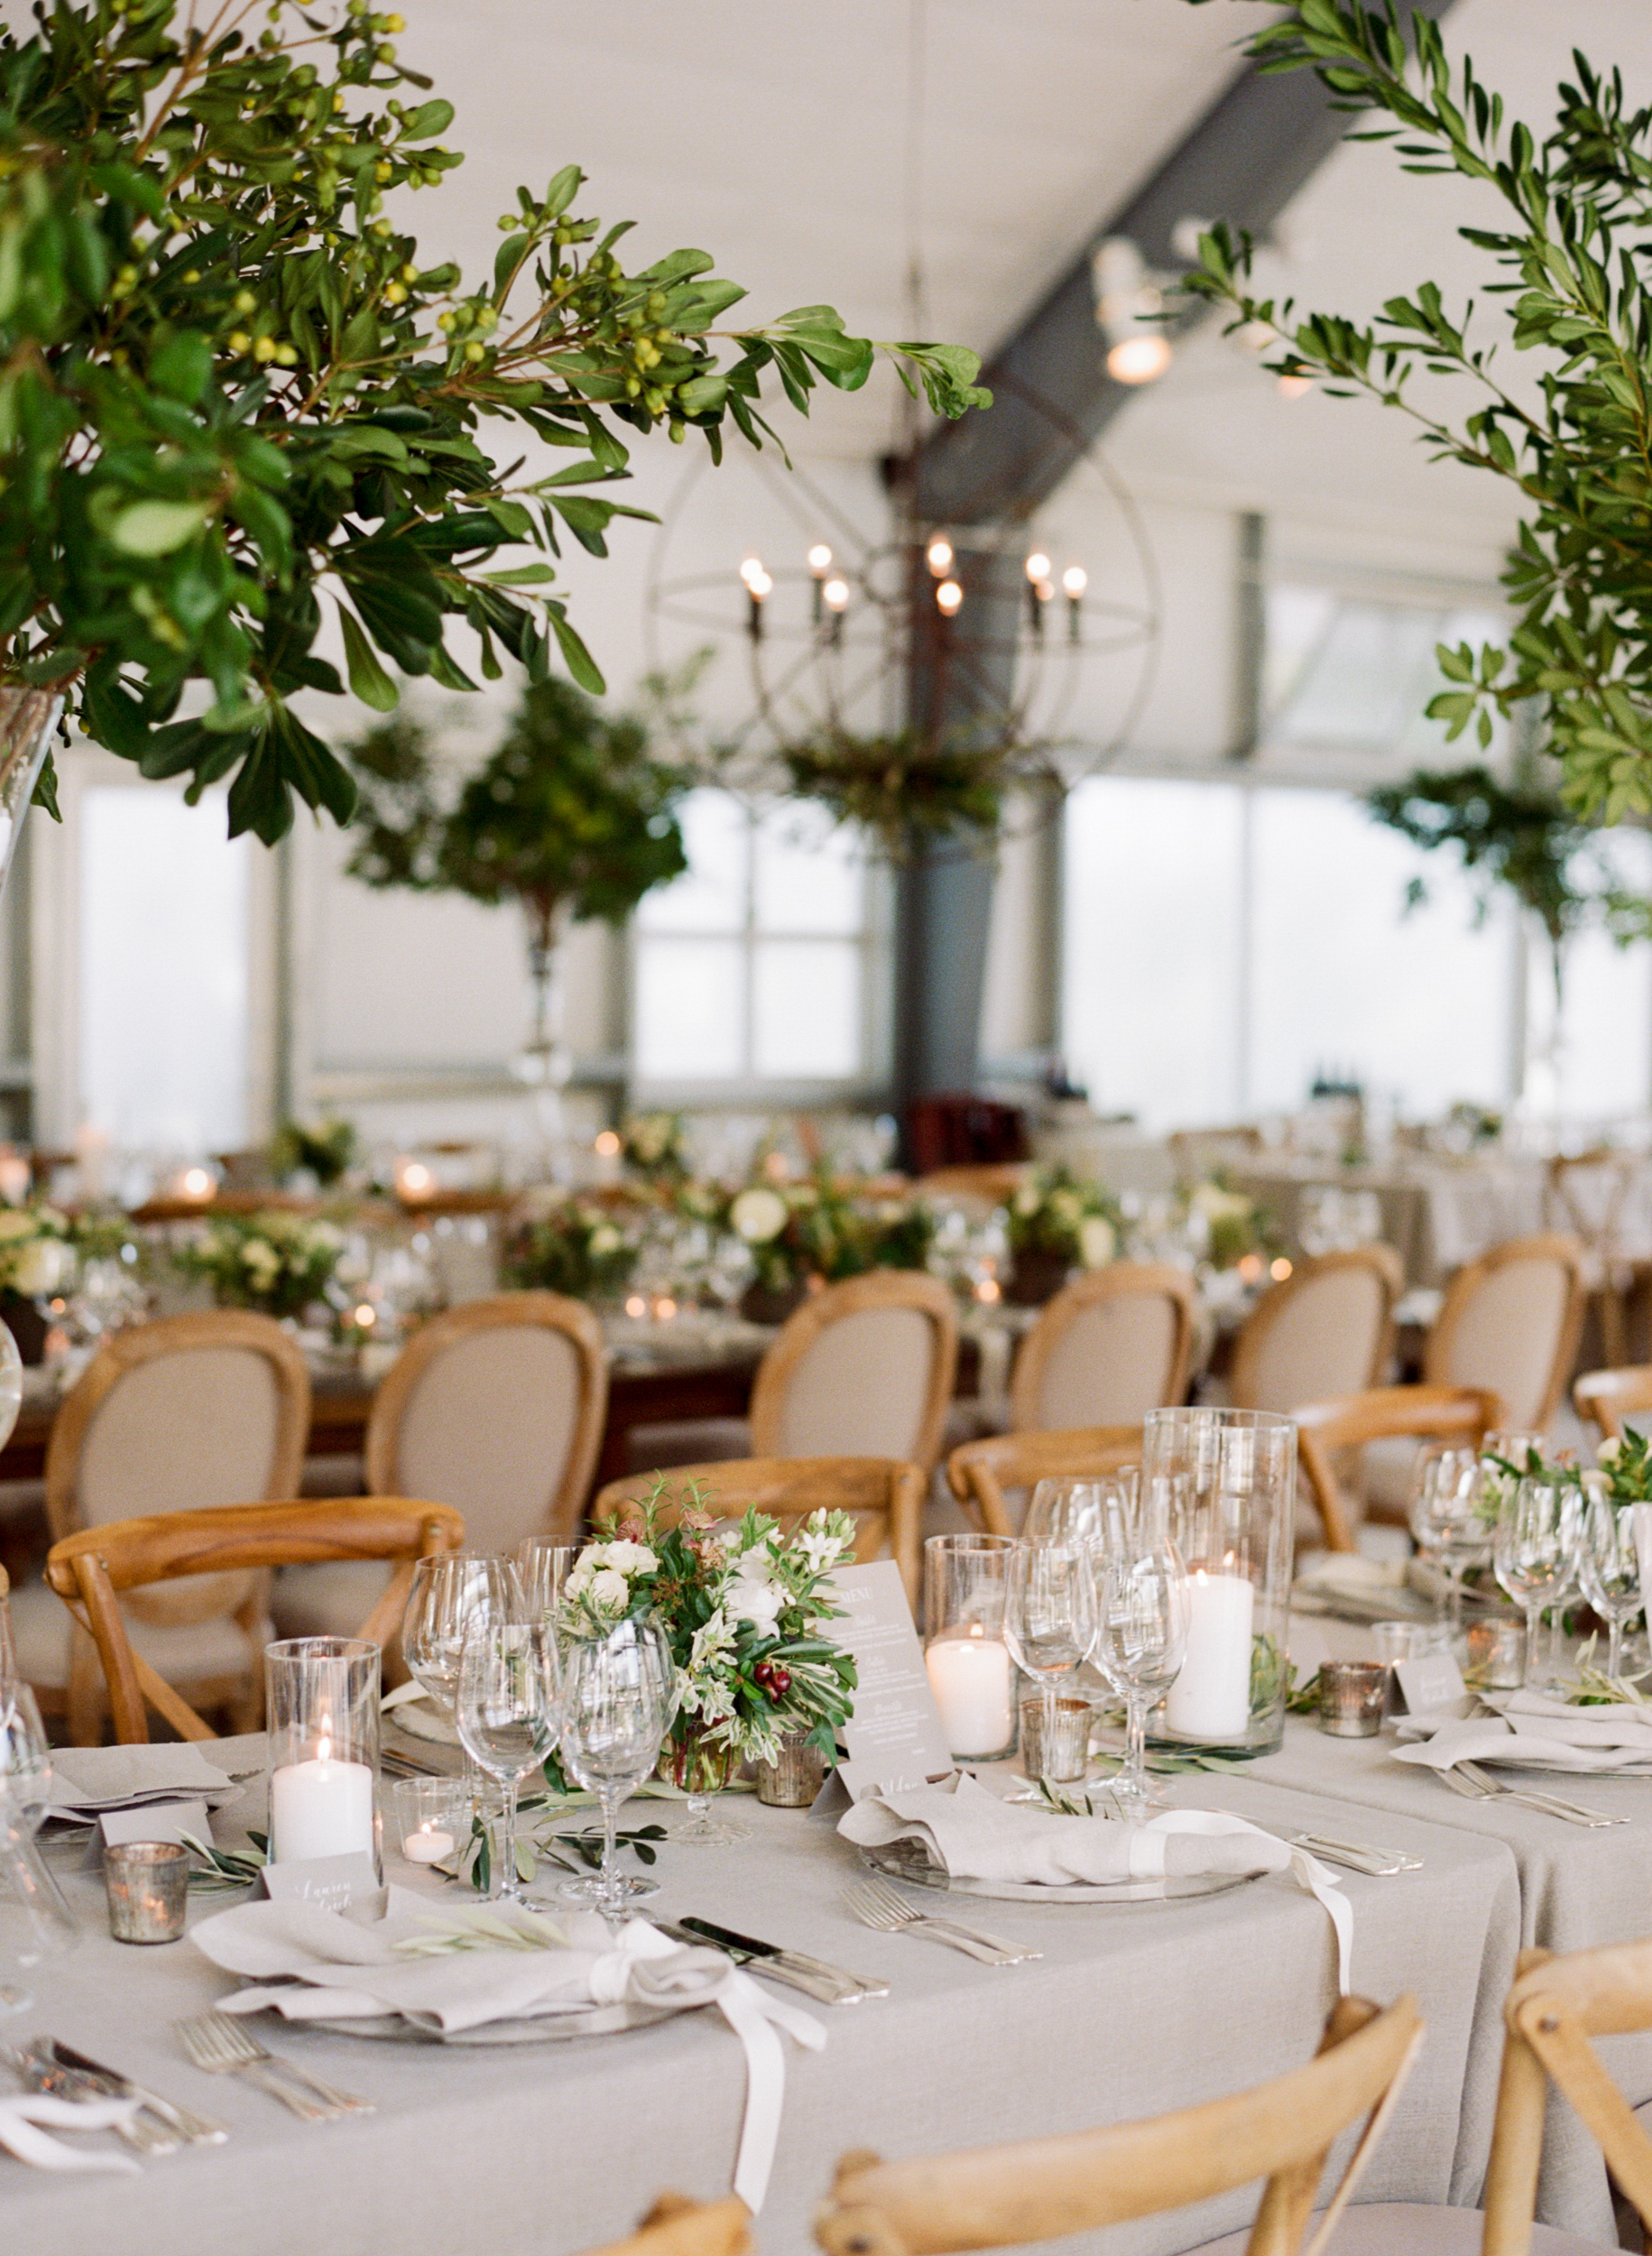 Small orange tree centerpieces, elegant linen table settings; Sylvie Gil Photography